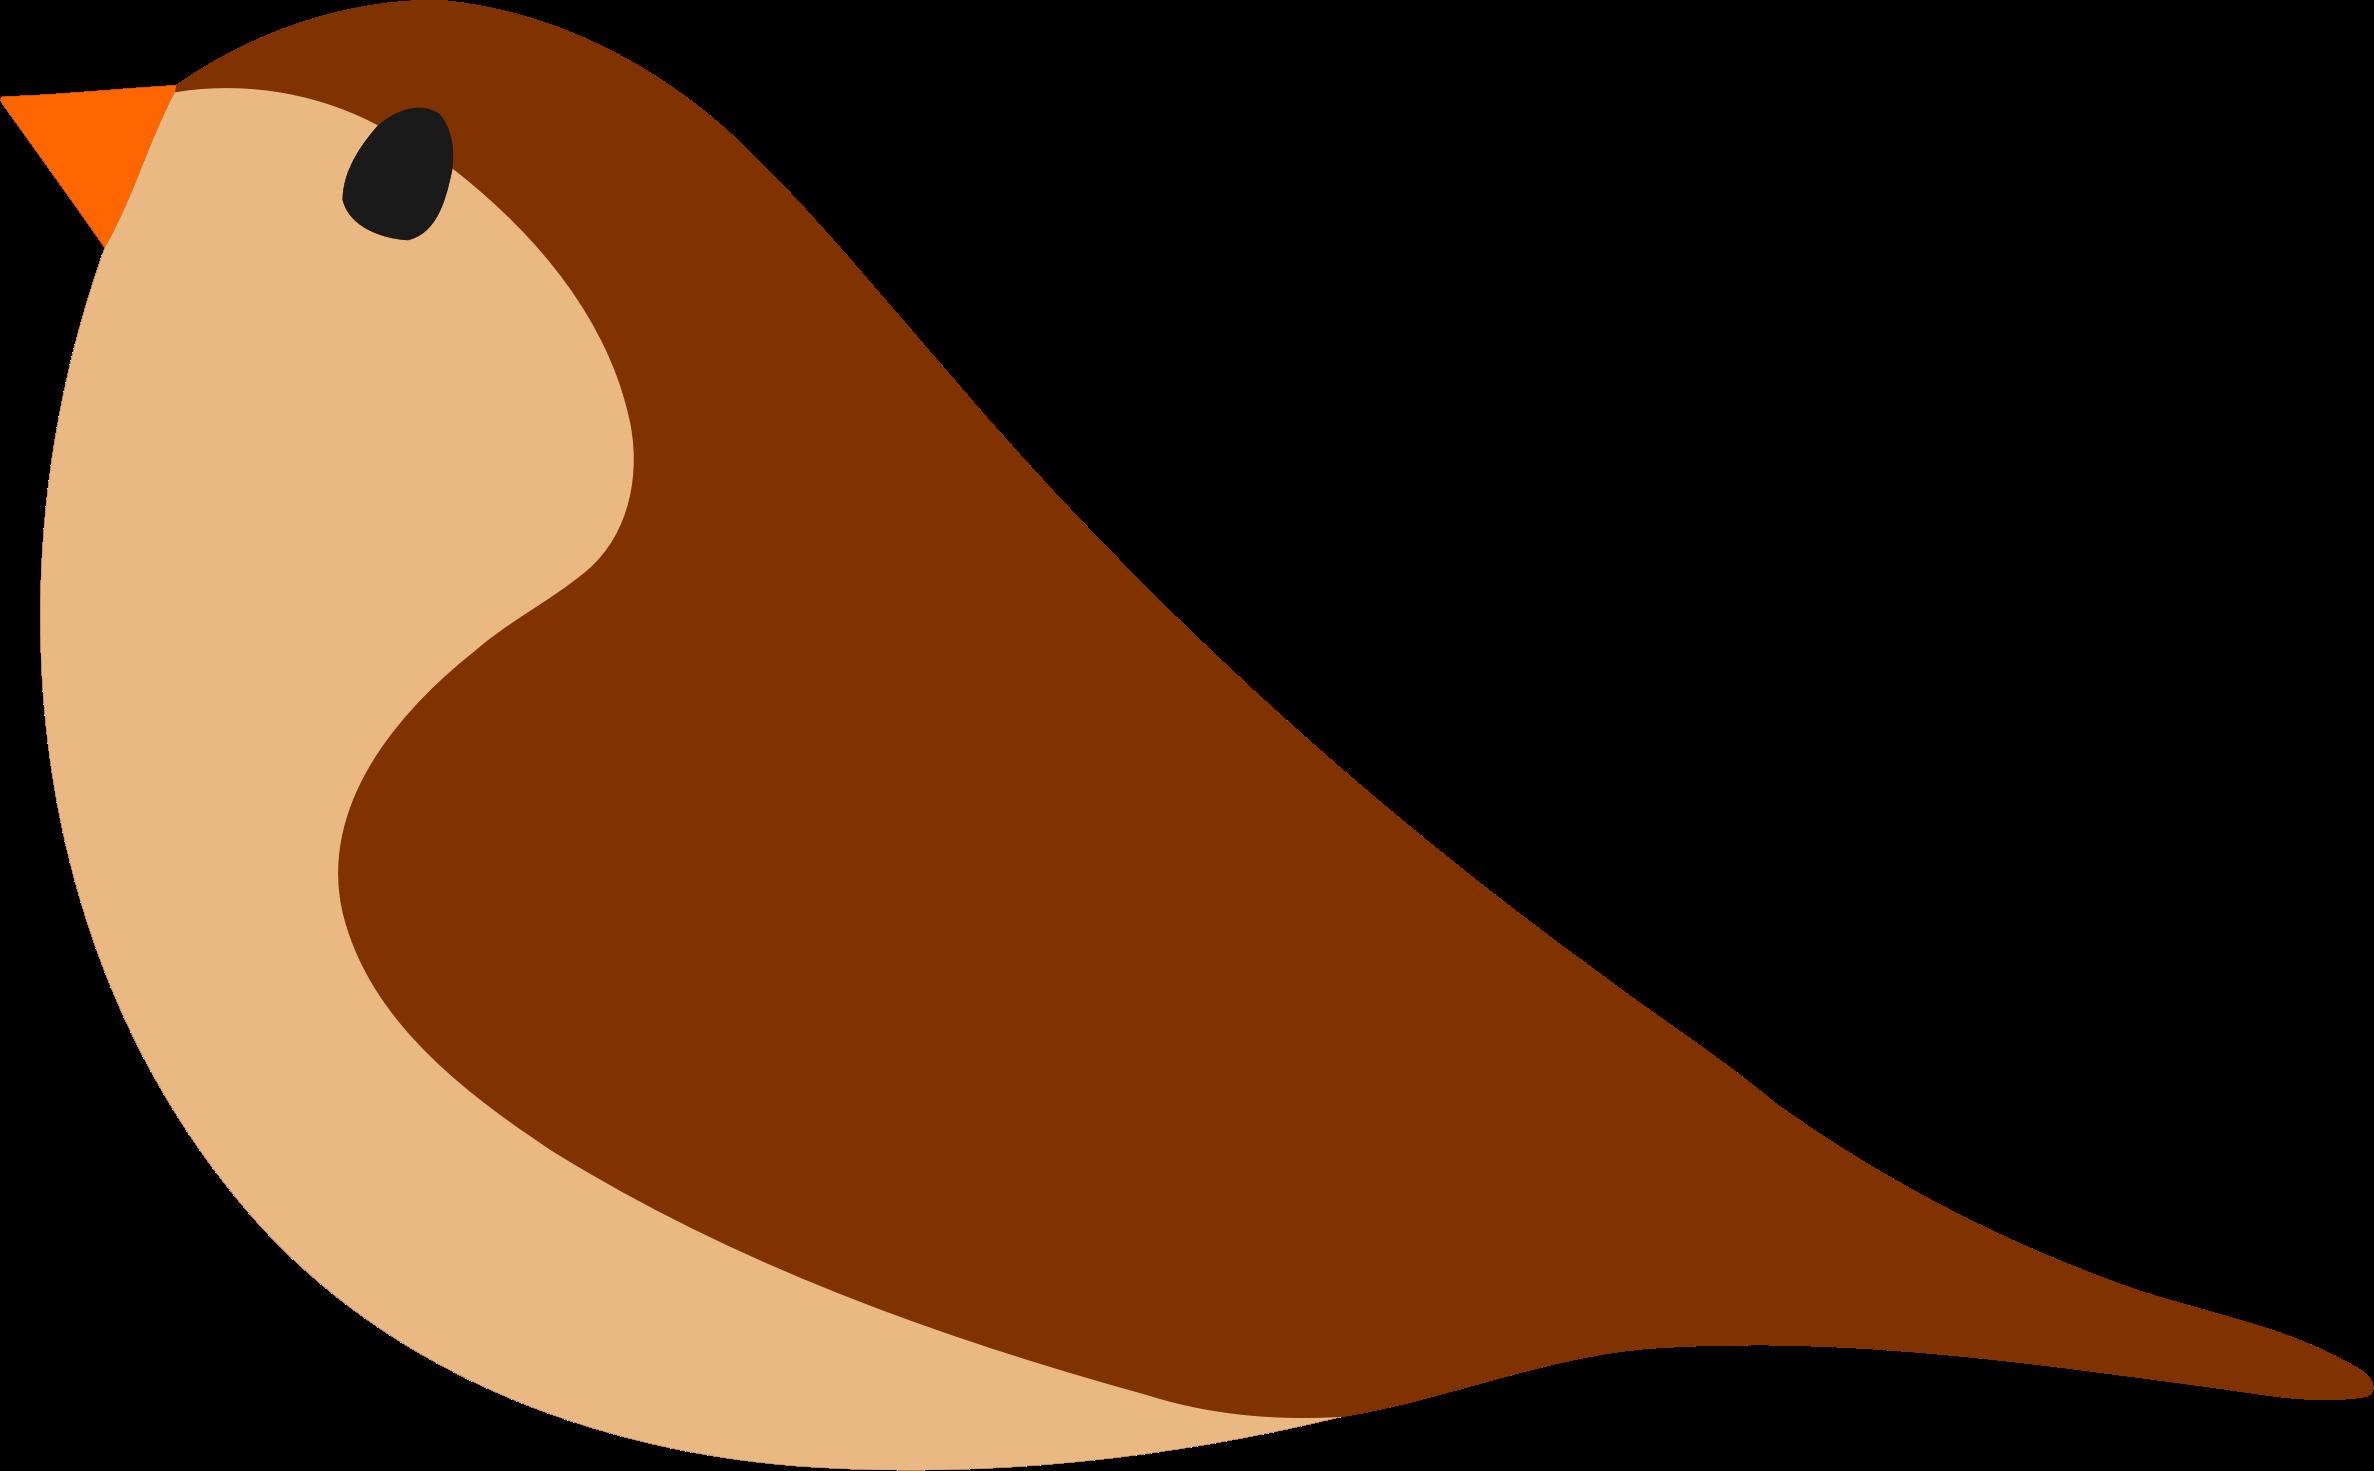 Simple bird big image. Birds clipart basic